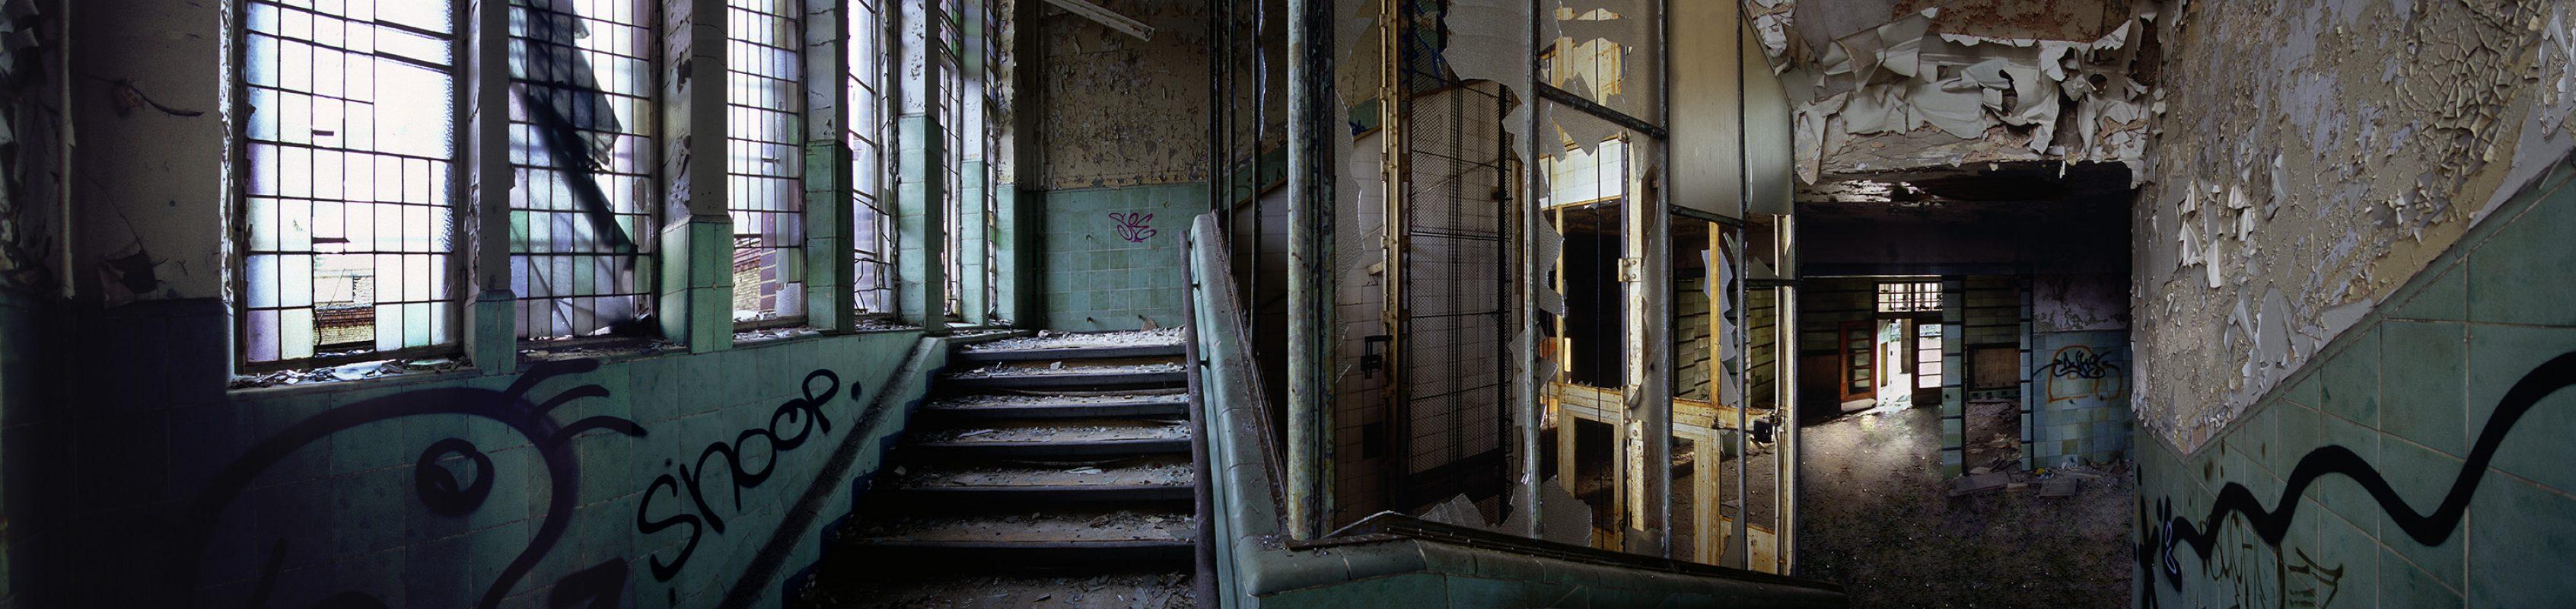 Beelitz-Heilstätten, grüner aufgang